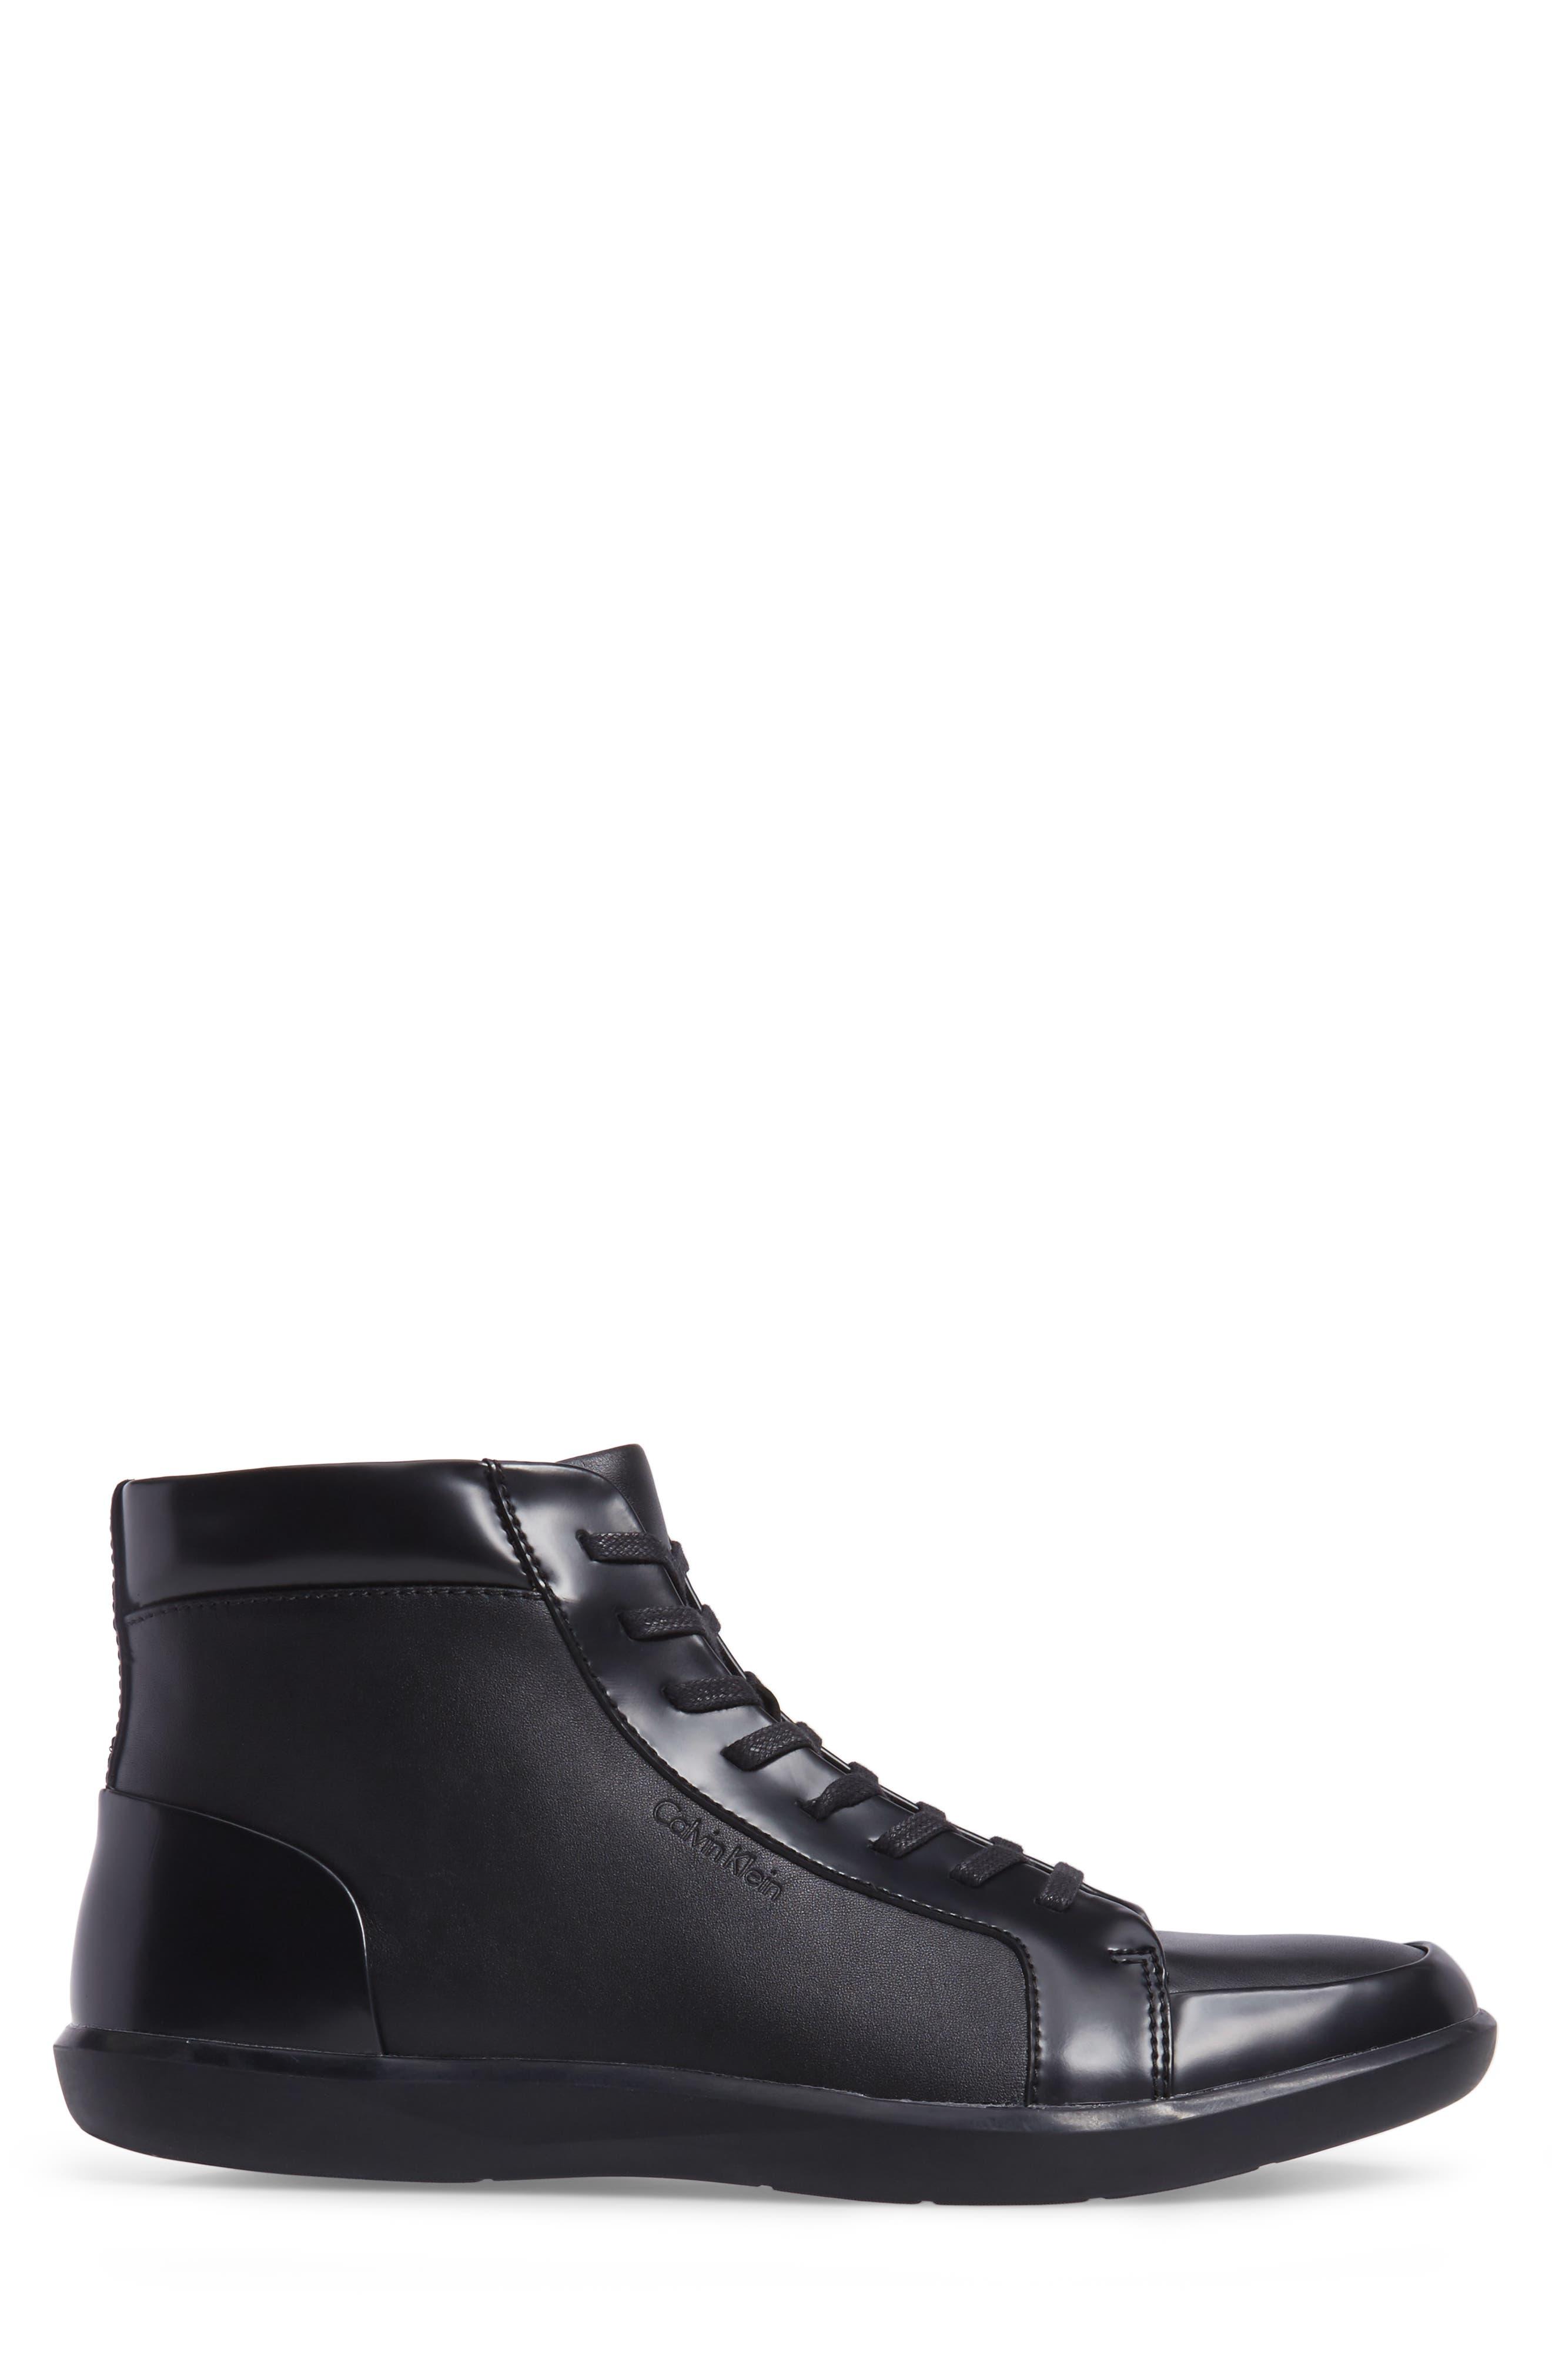 Malvern Sneaker,                             Alternate thumbnail 3, color,                             001